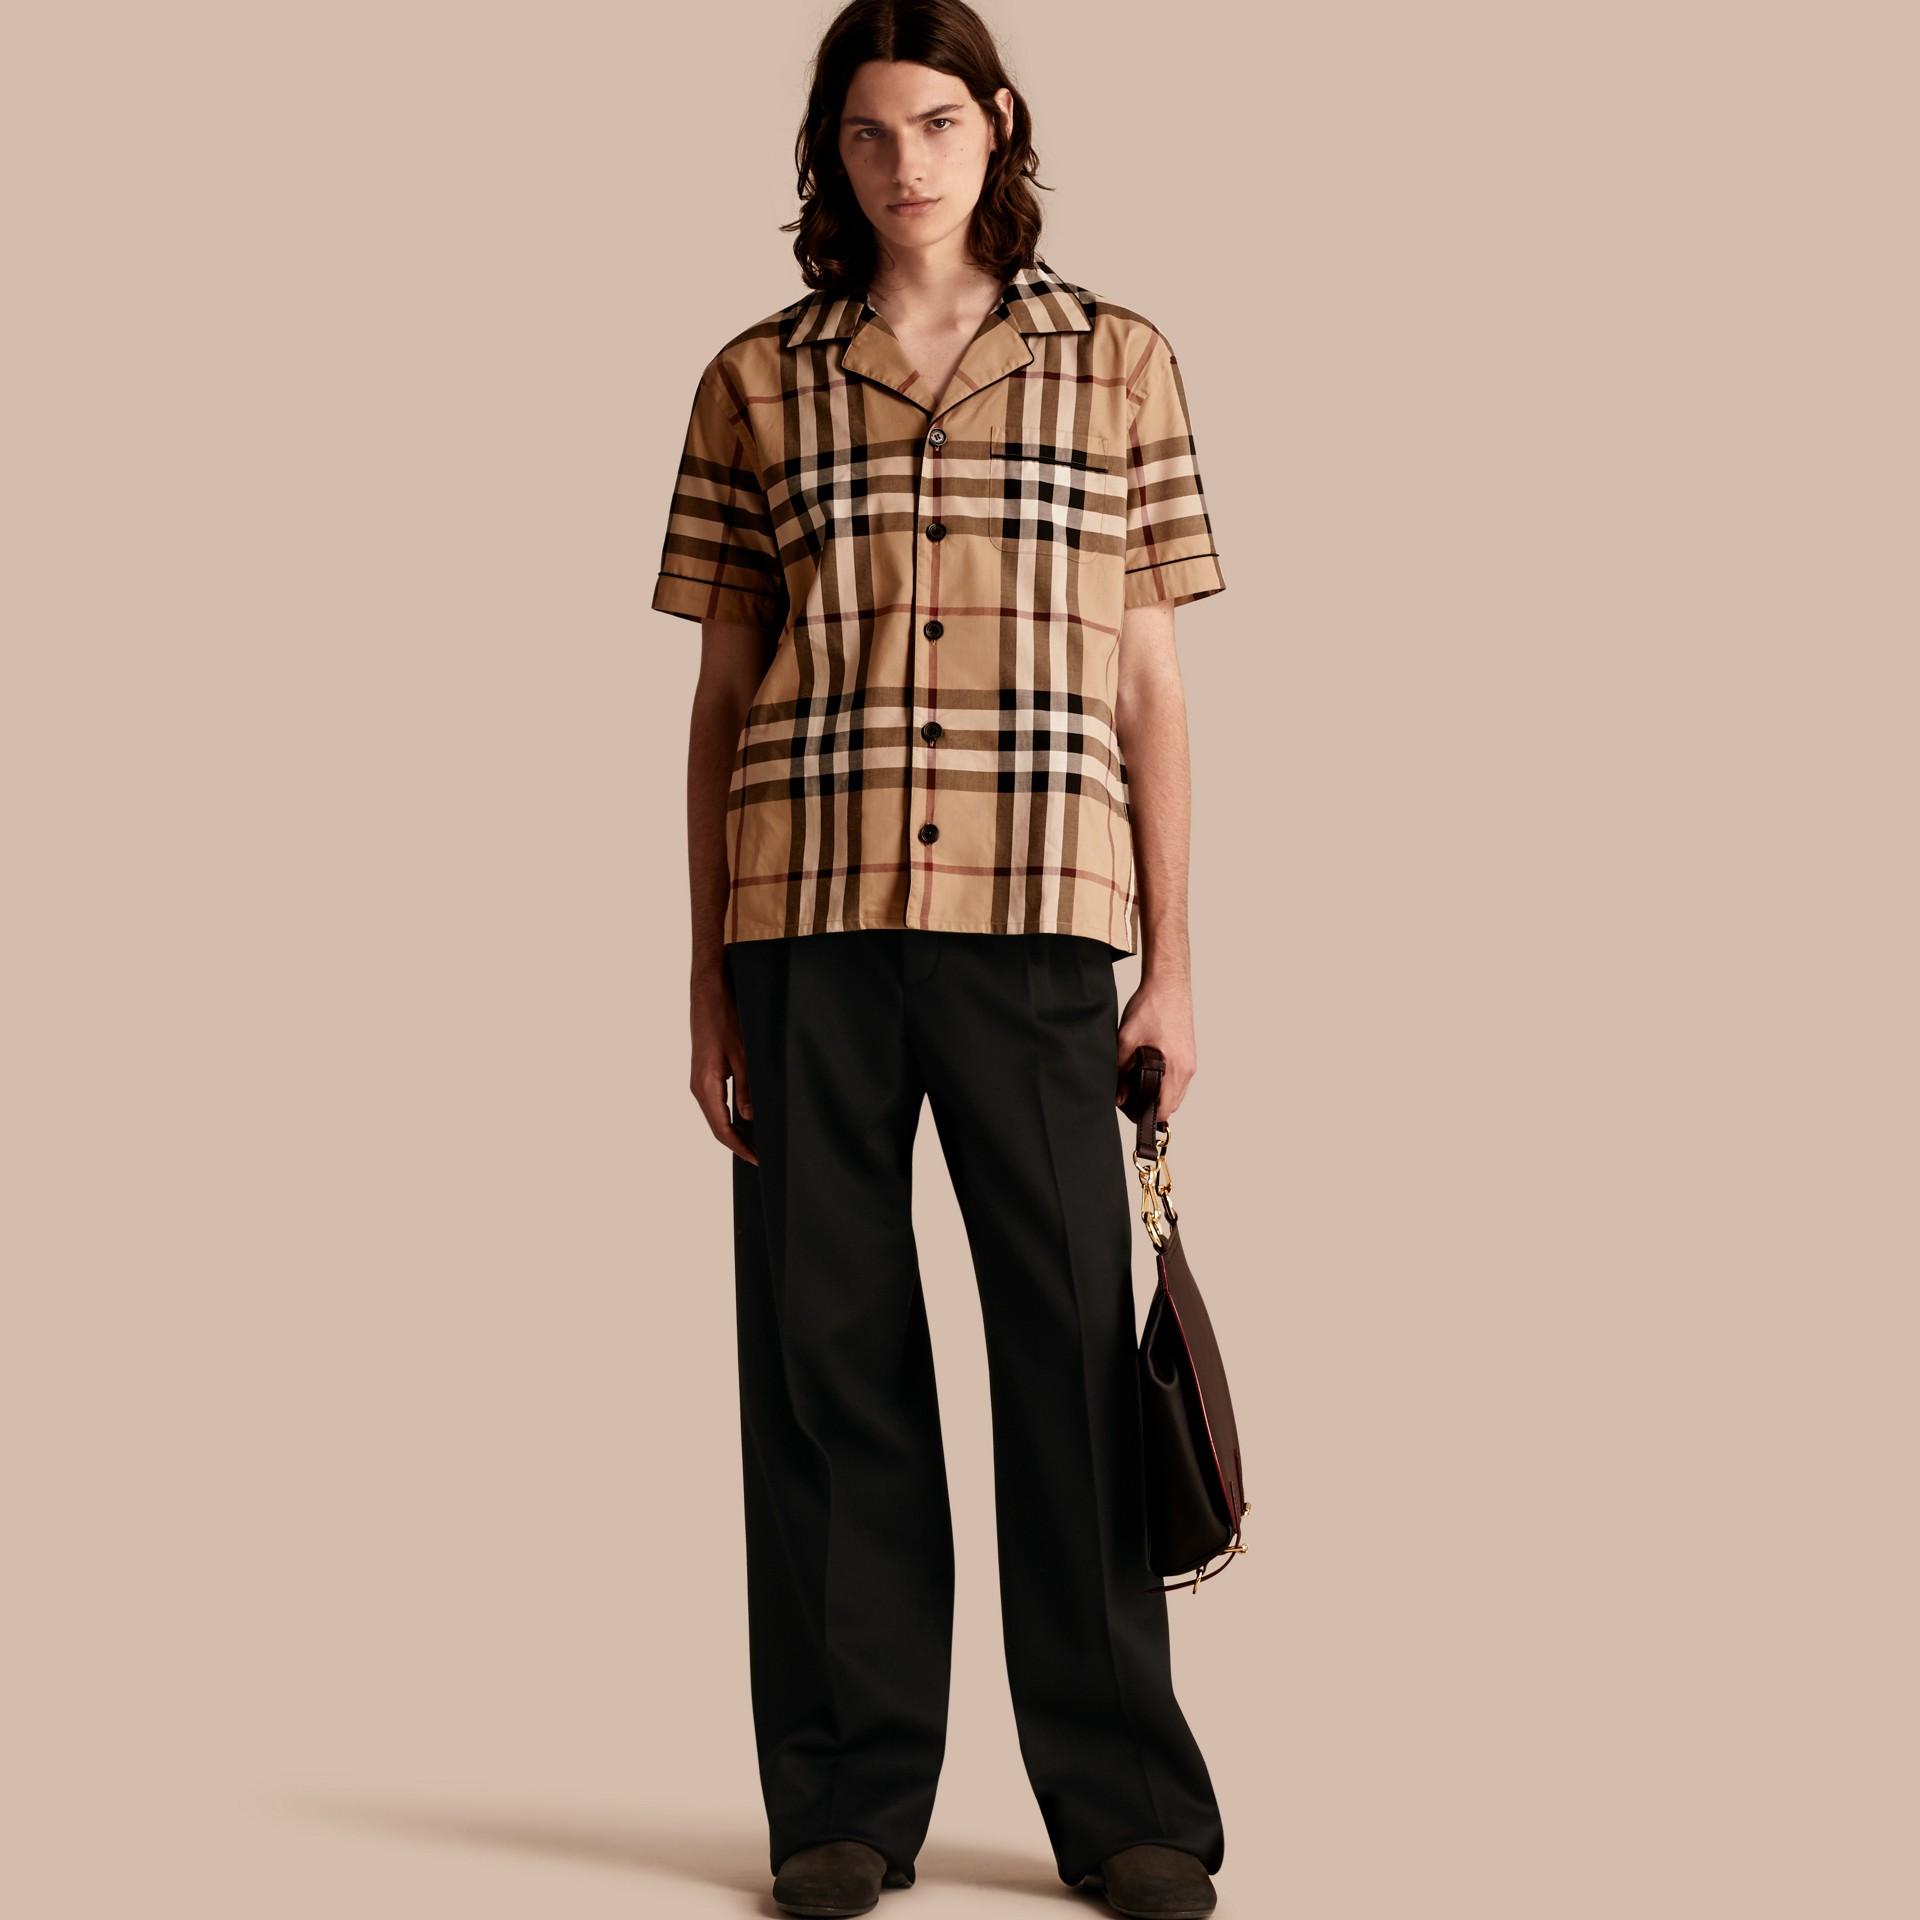 Cotton Poplin Pyjama-style Shirt in Camel - gallery image 1